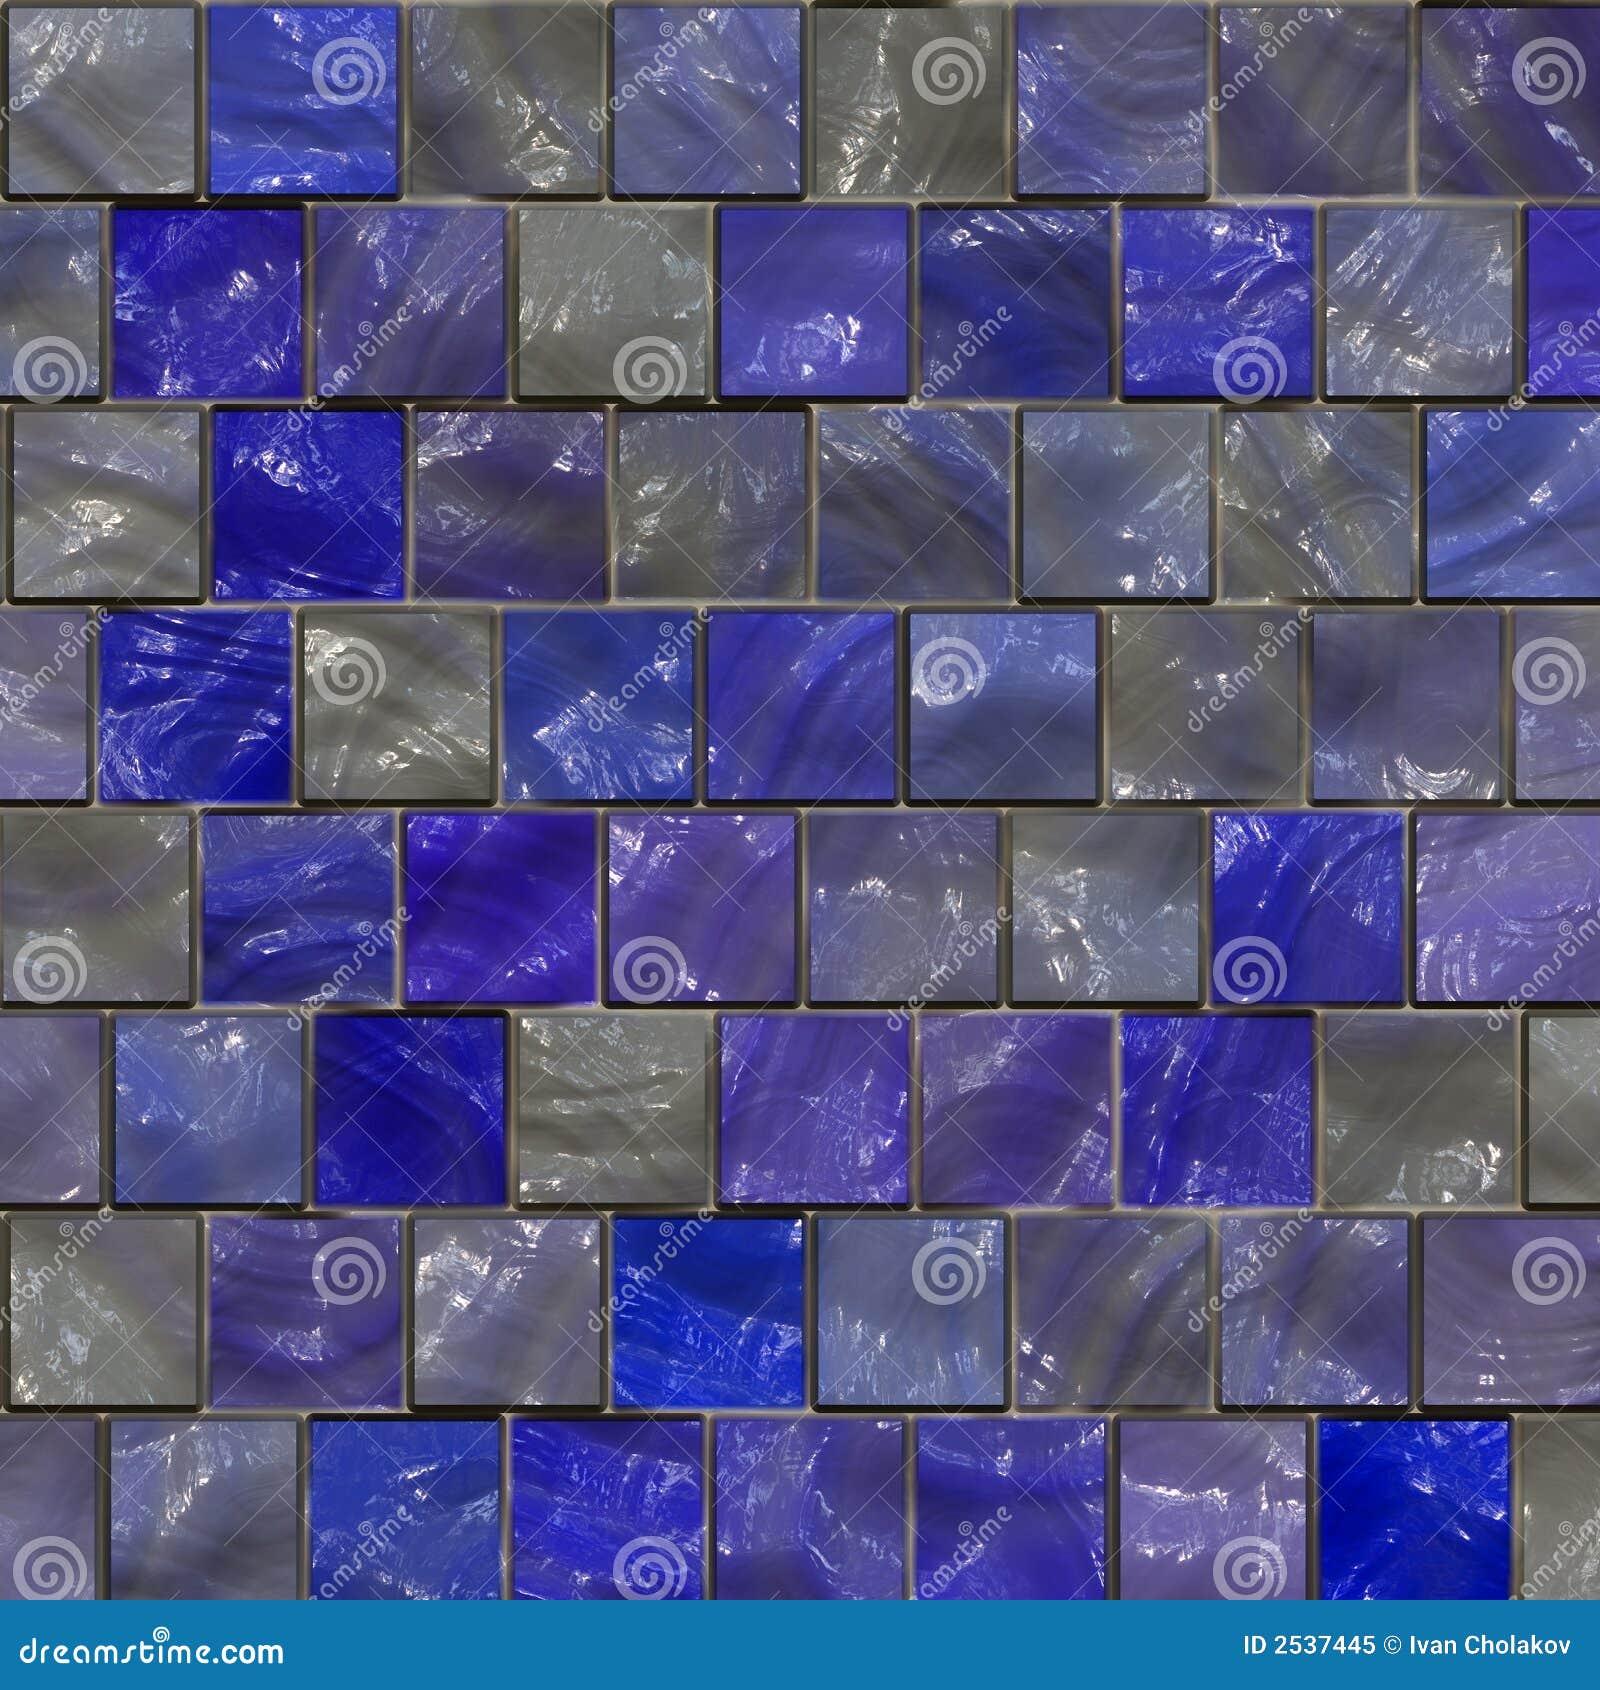 Artistic ceramic tile stock illustration illustration of artistic ceramic tile dailygadgetfo Gallery